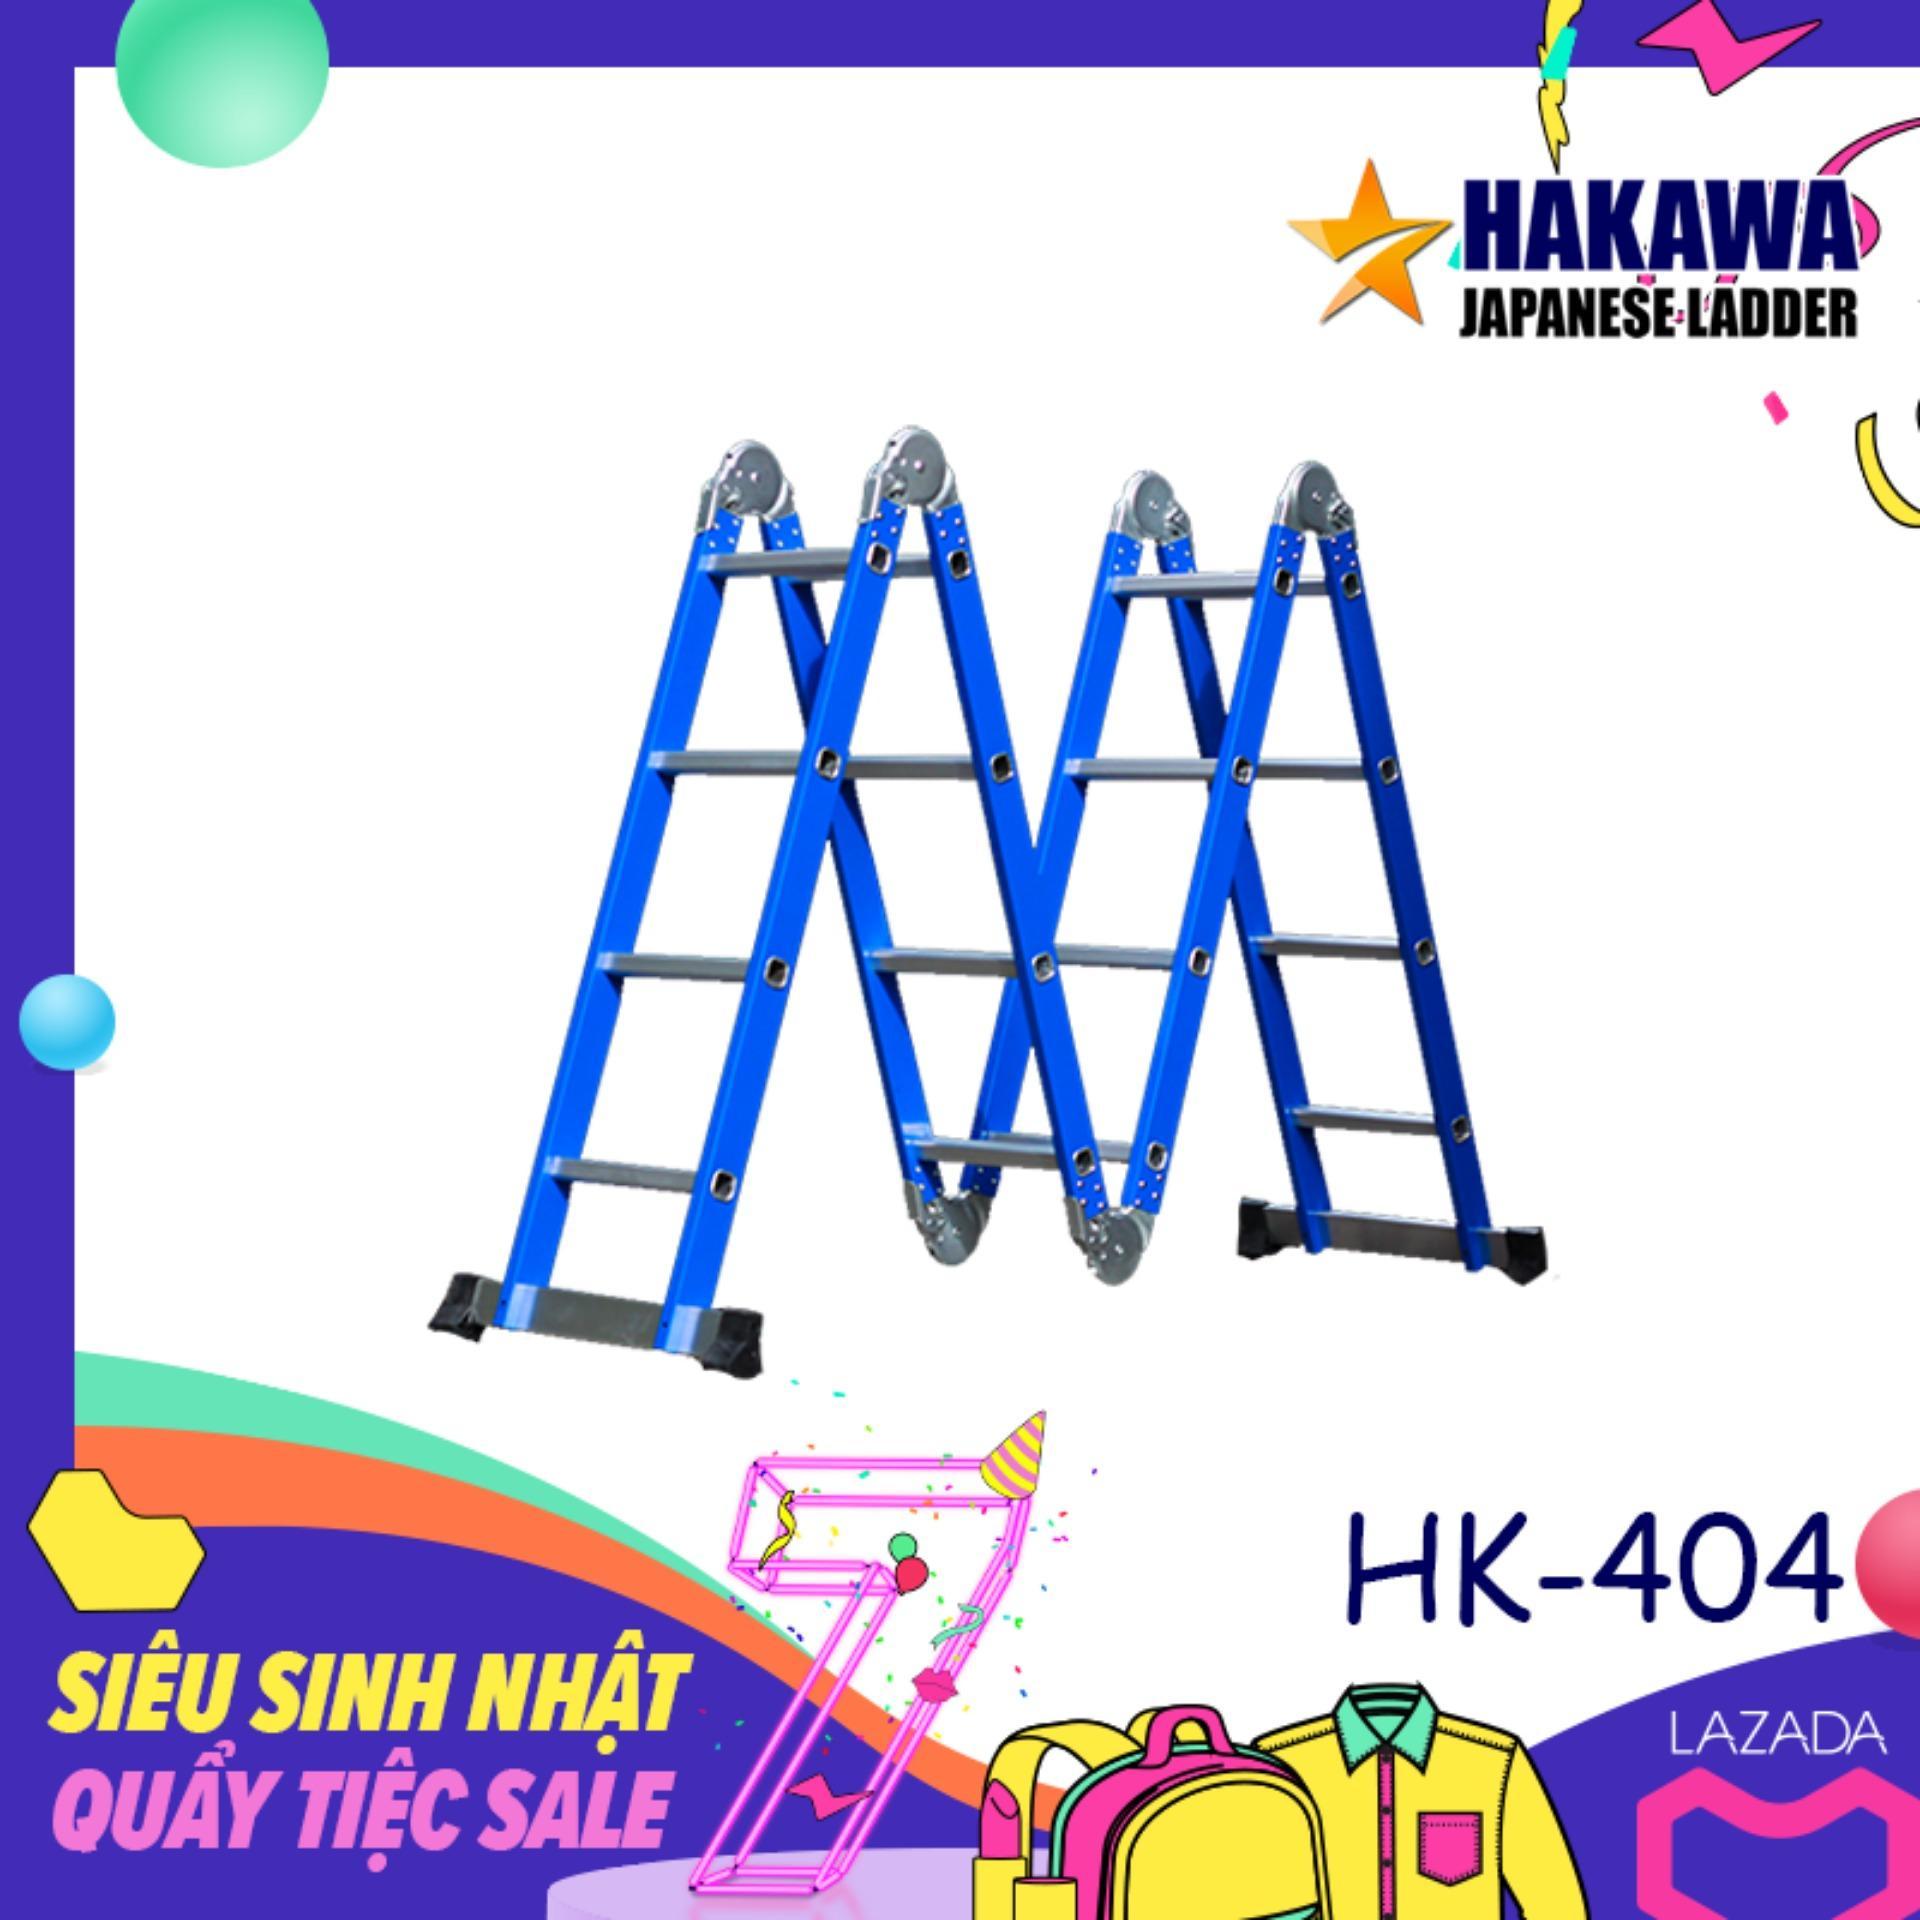 [HAKAWA]Thang nhom gap khuc da nang HAKAWA HK404  - Dùng trong gia đình ( cao 4.7 mét)